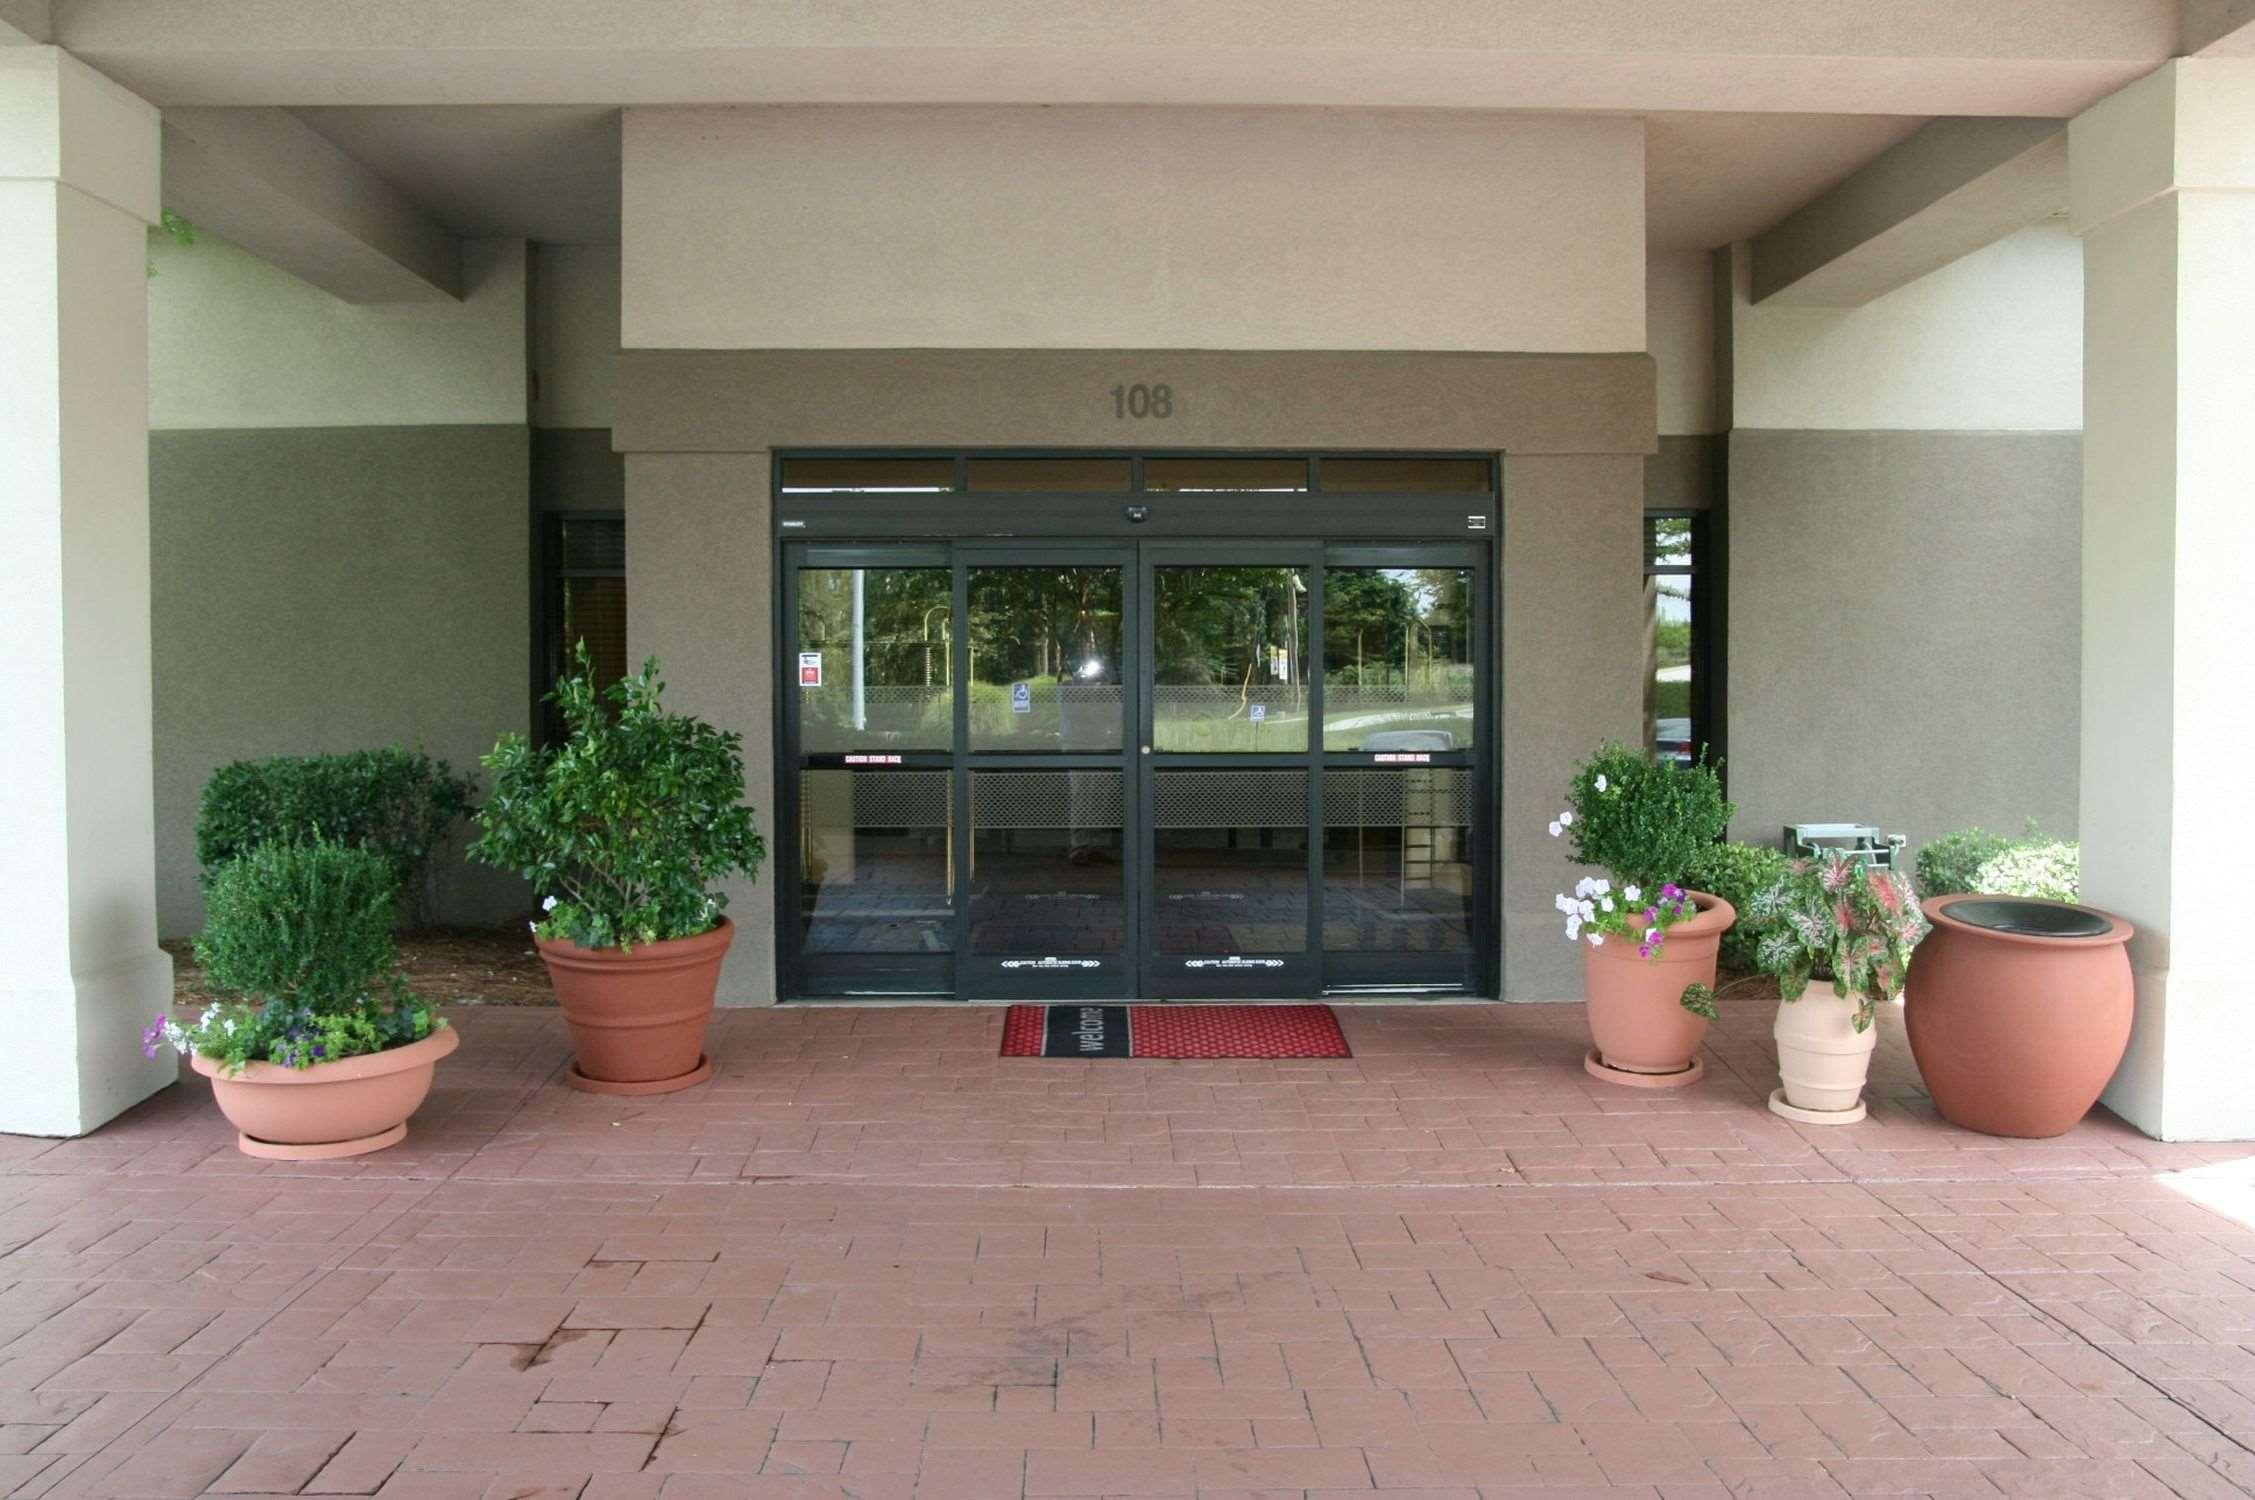 Hampton Inn & Suites Greenville/Spartanburg I-85 image 1